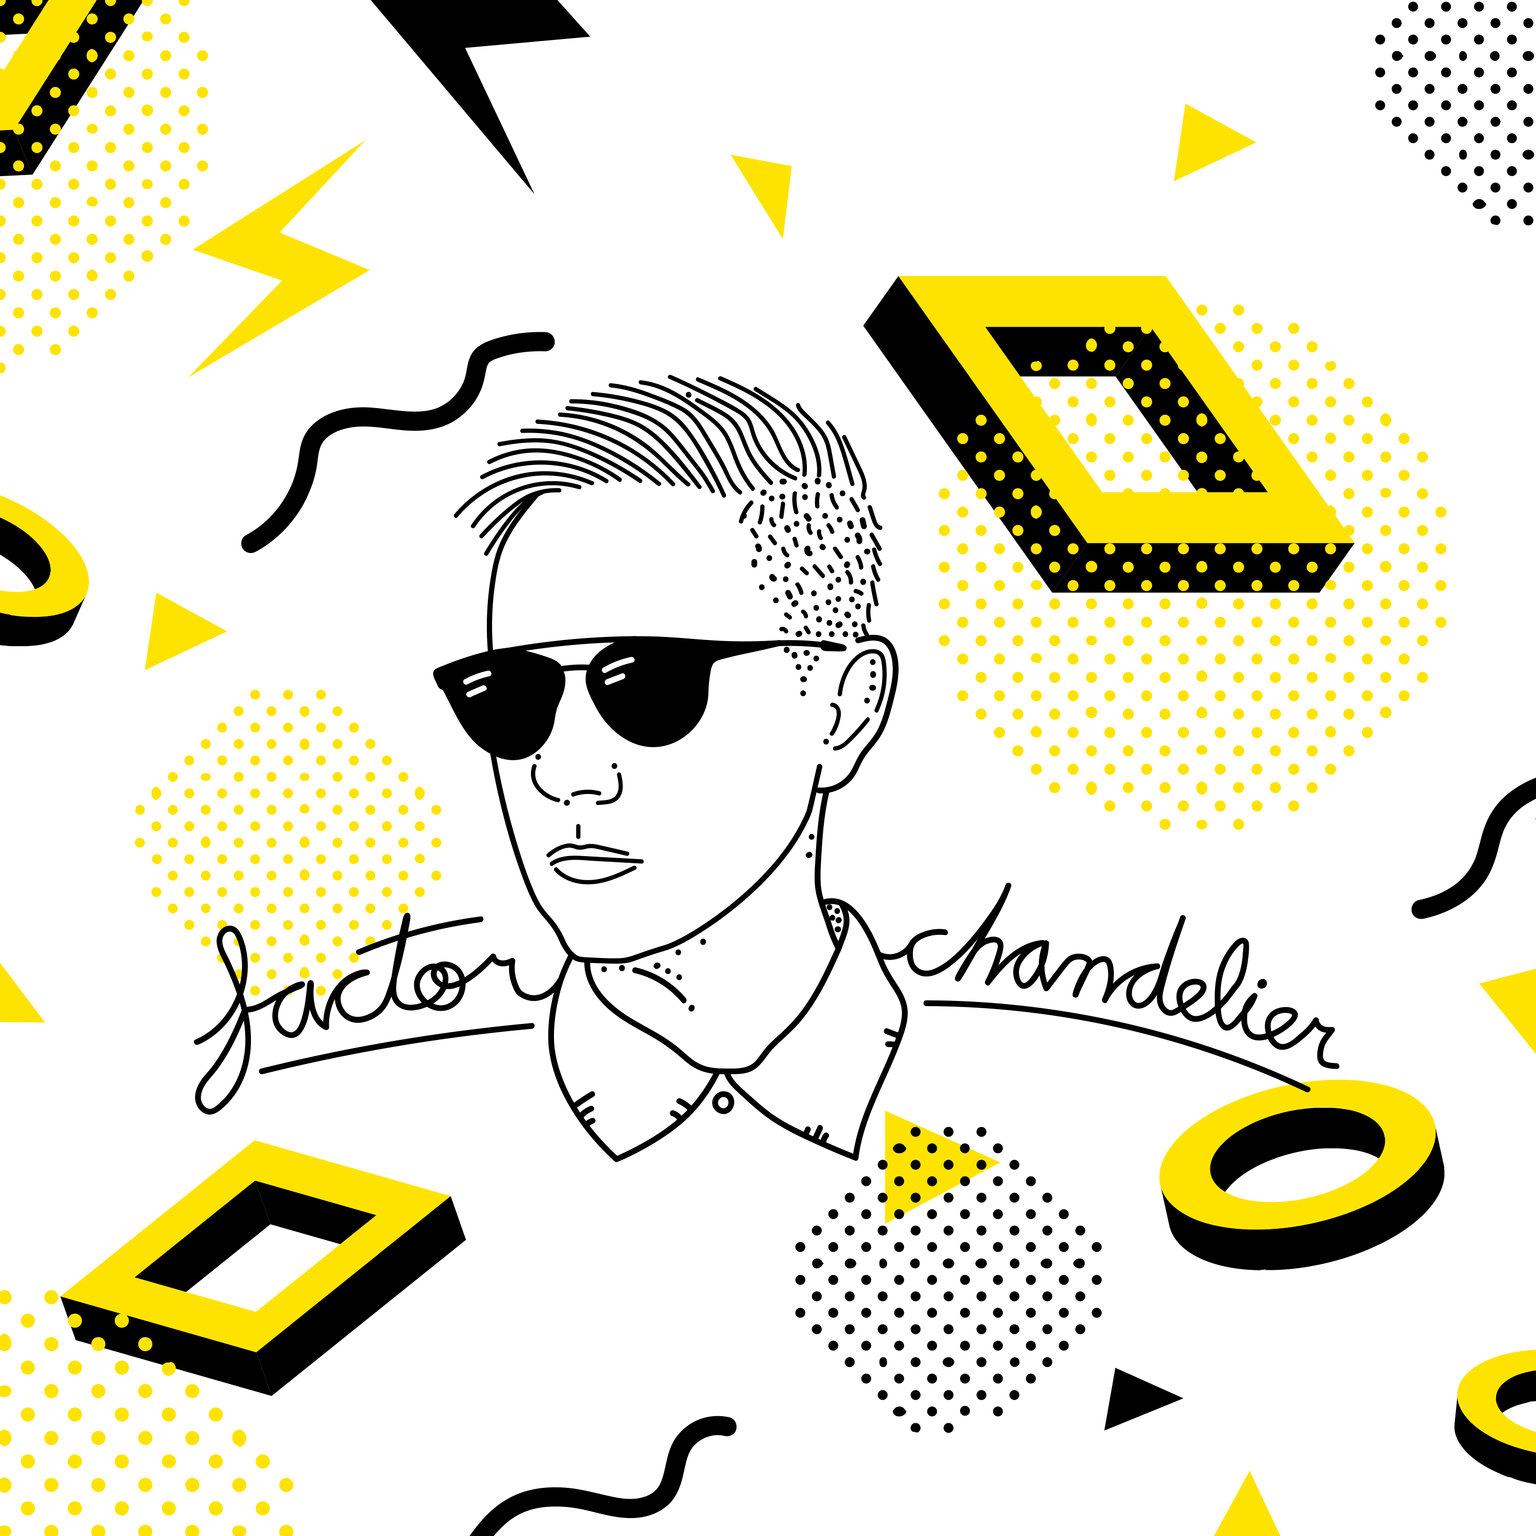 Episode 1 - Factor Chandelier - Sideroad Records / Fake Four